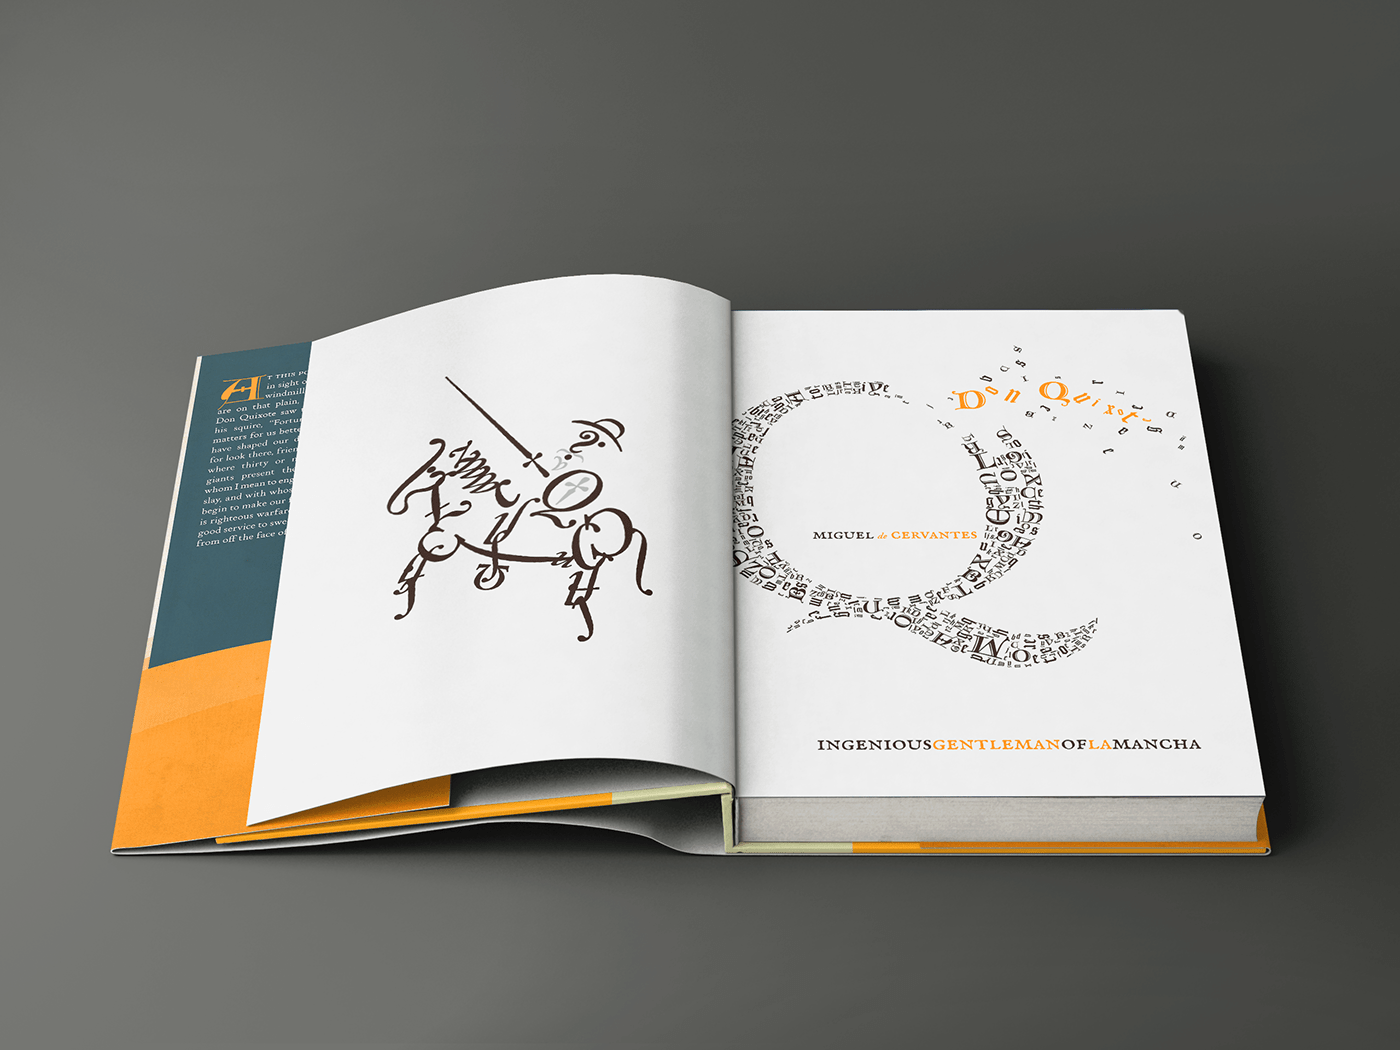 Typographic Illustration of Don Quixote